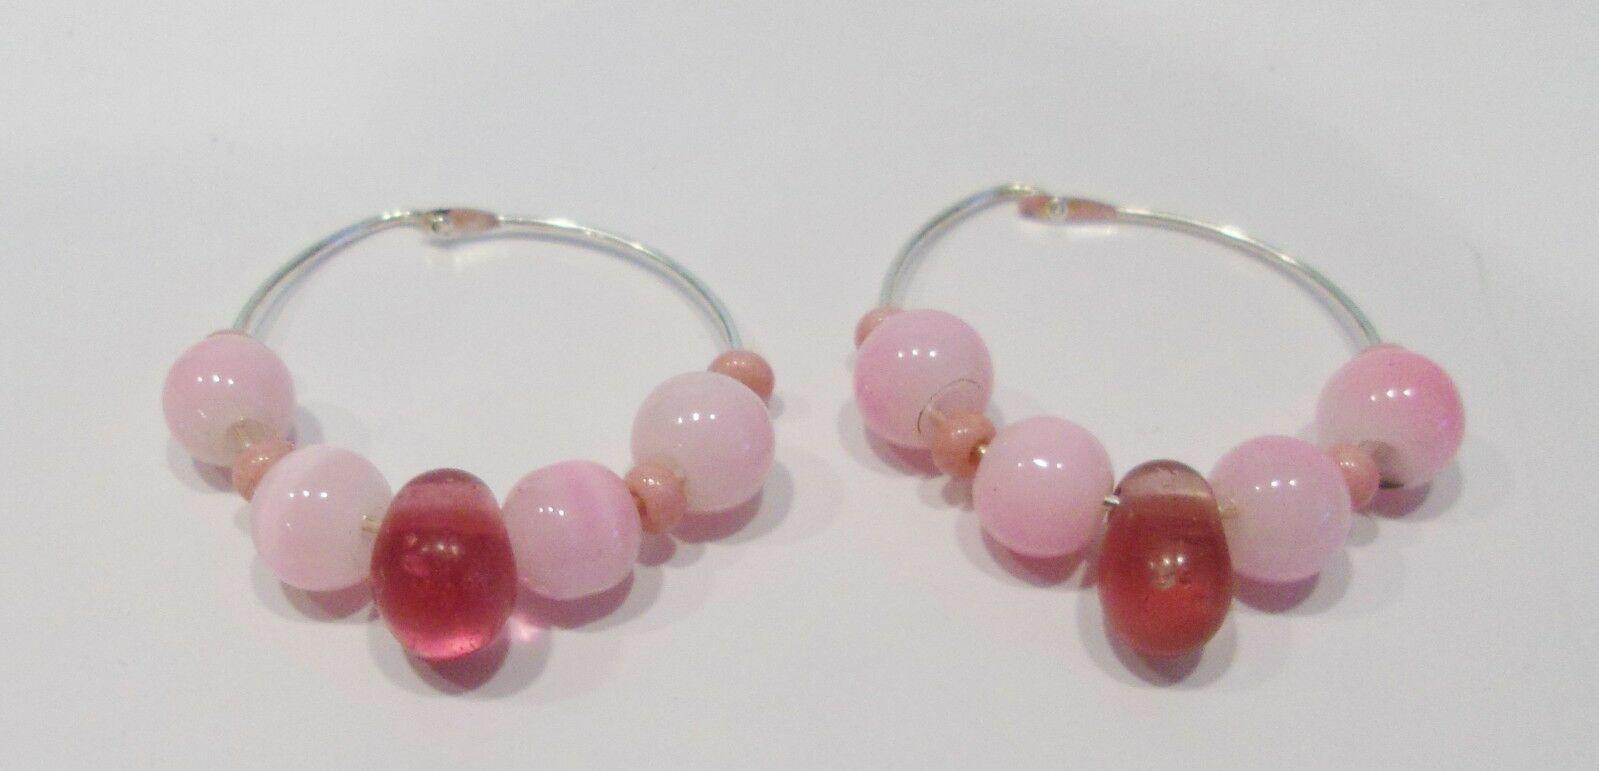 handmade silver hoop earrings with pink cat eye beads and rose tear drop beads